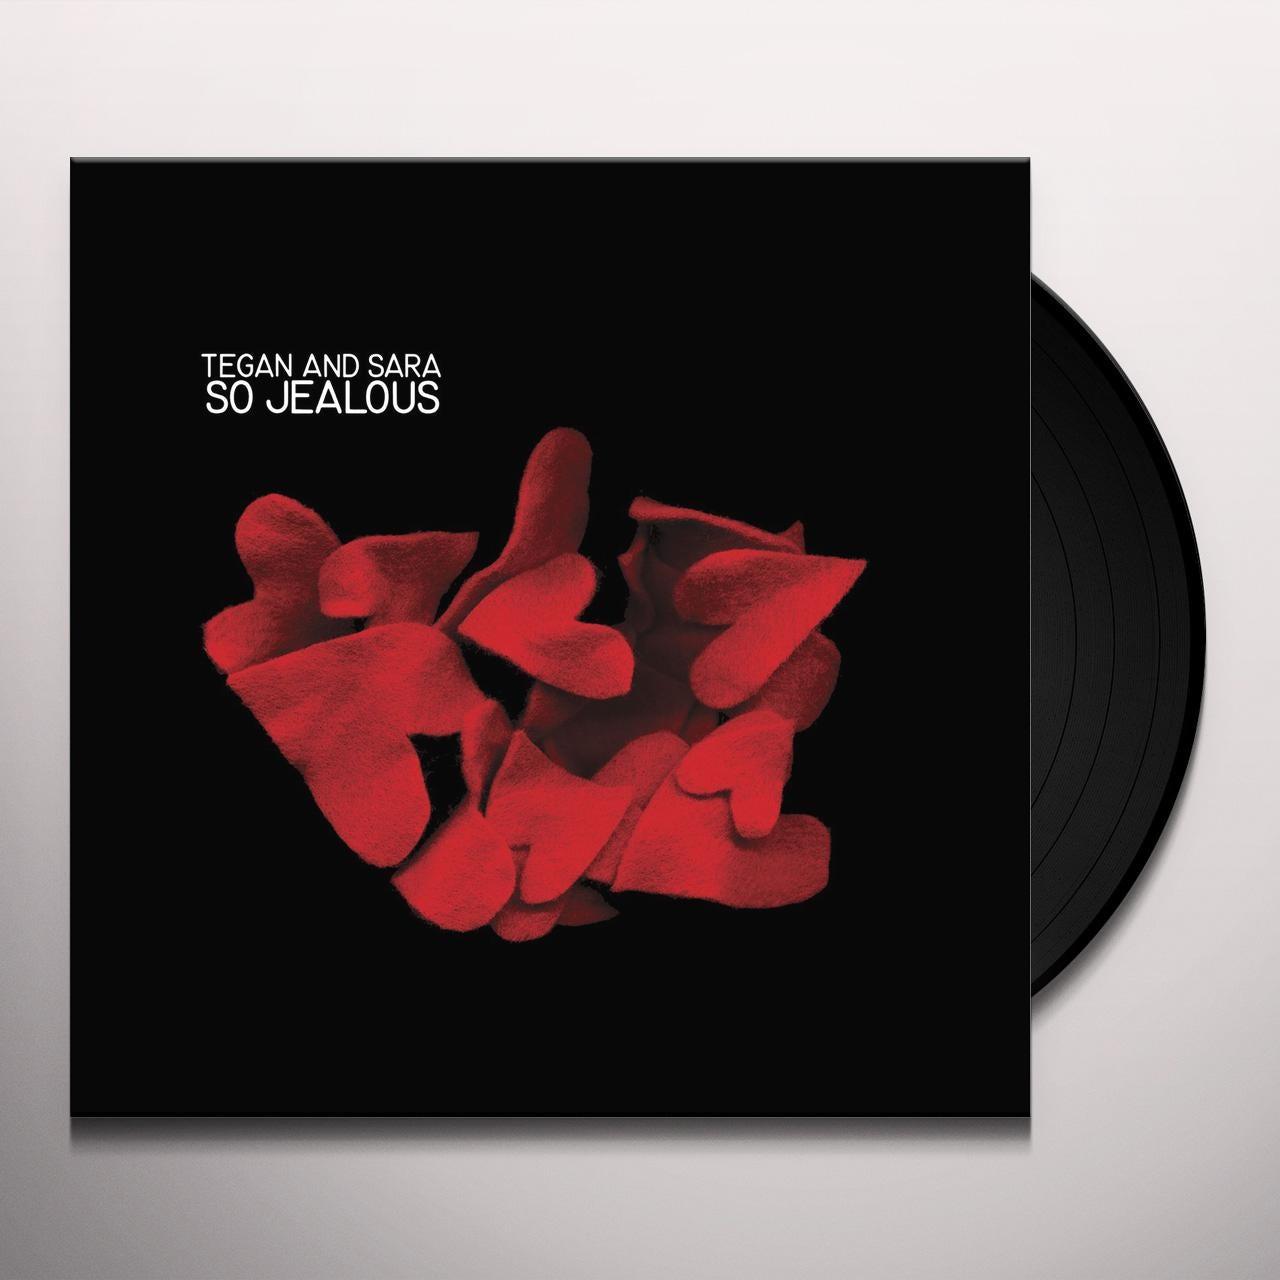 Tegan Amp Sara So Jealous Vinyl Record